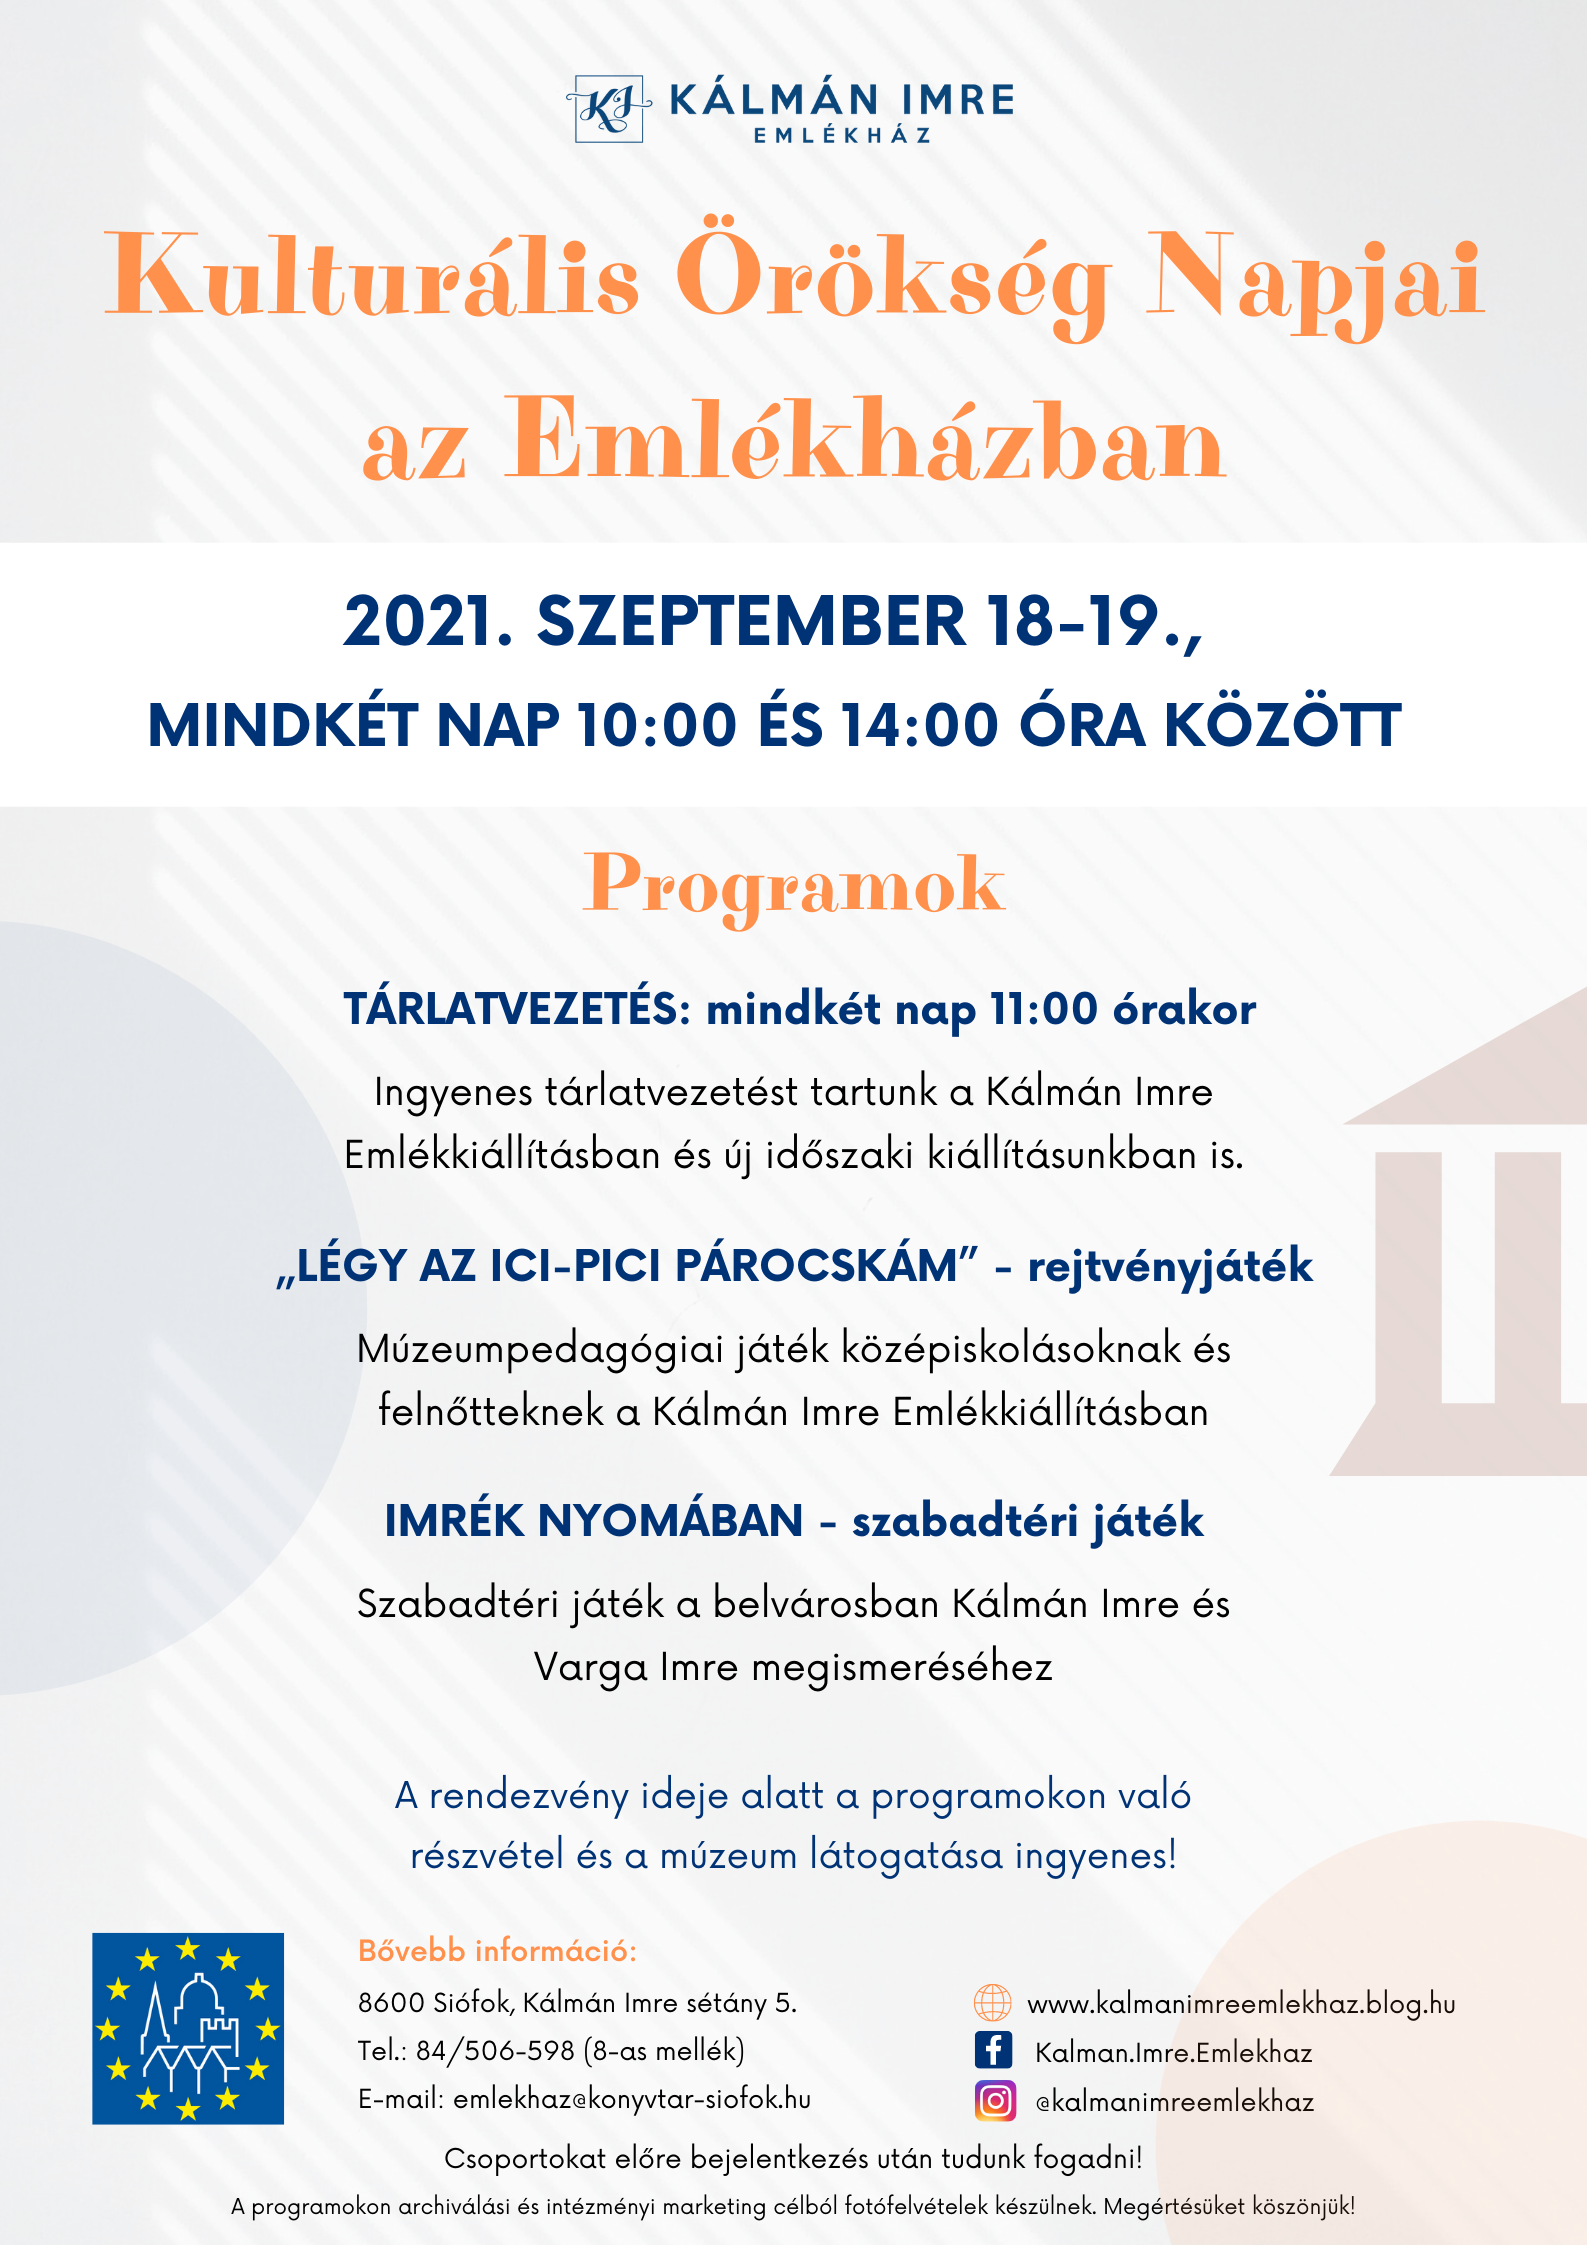 2021_09_18-19_orokseg-napjai_plakat.png